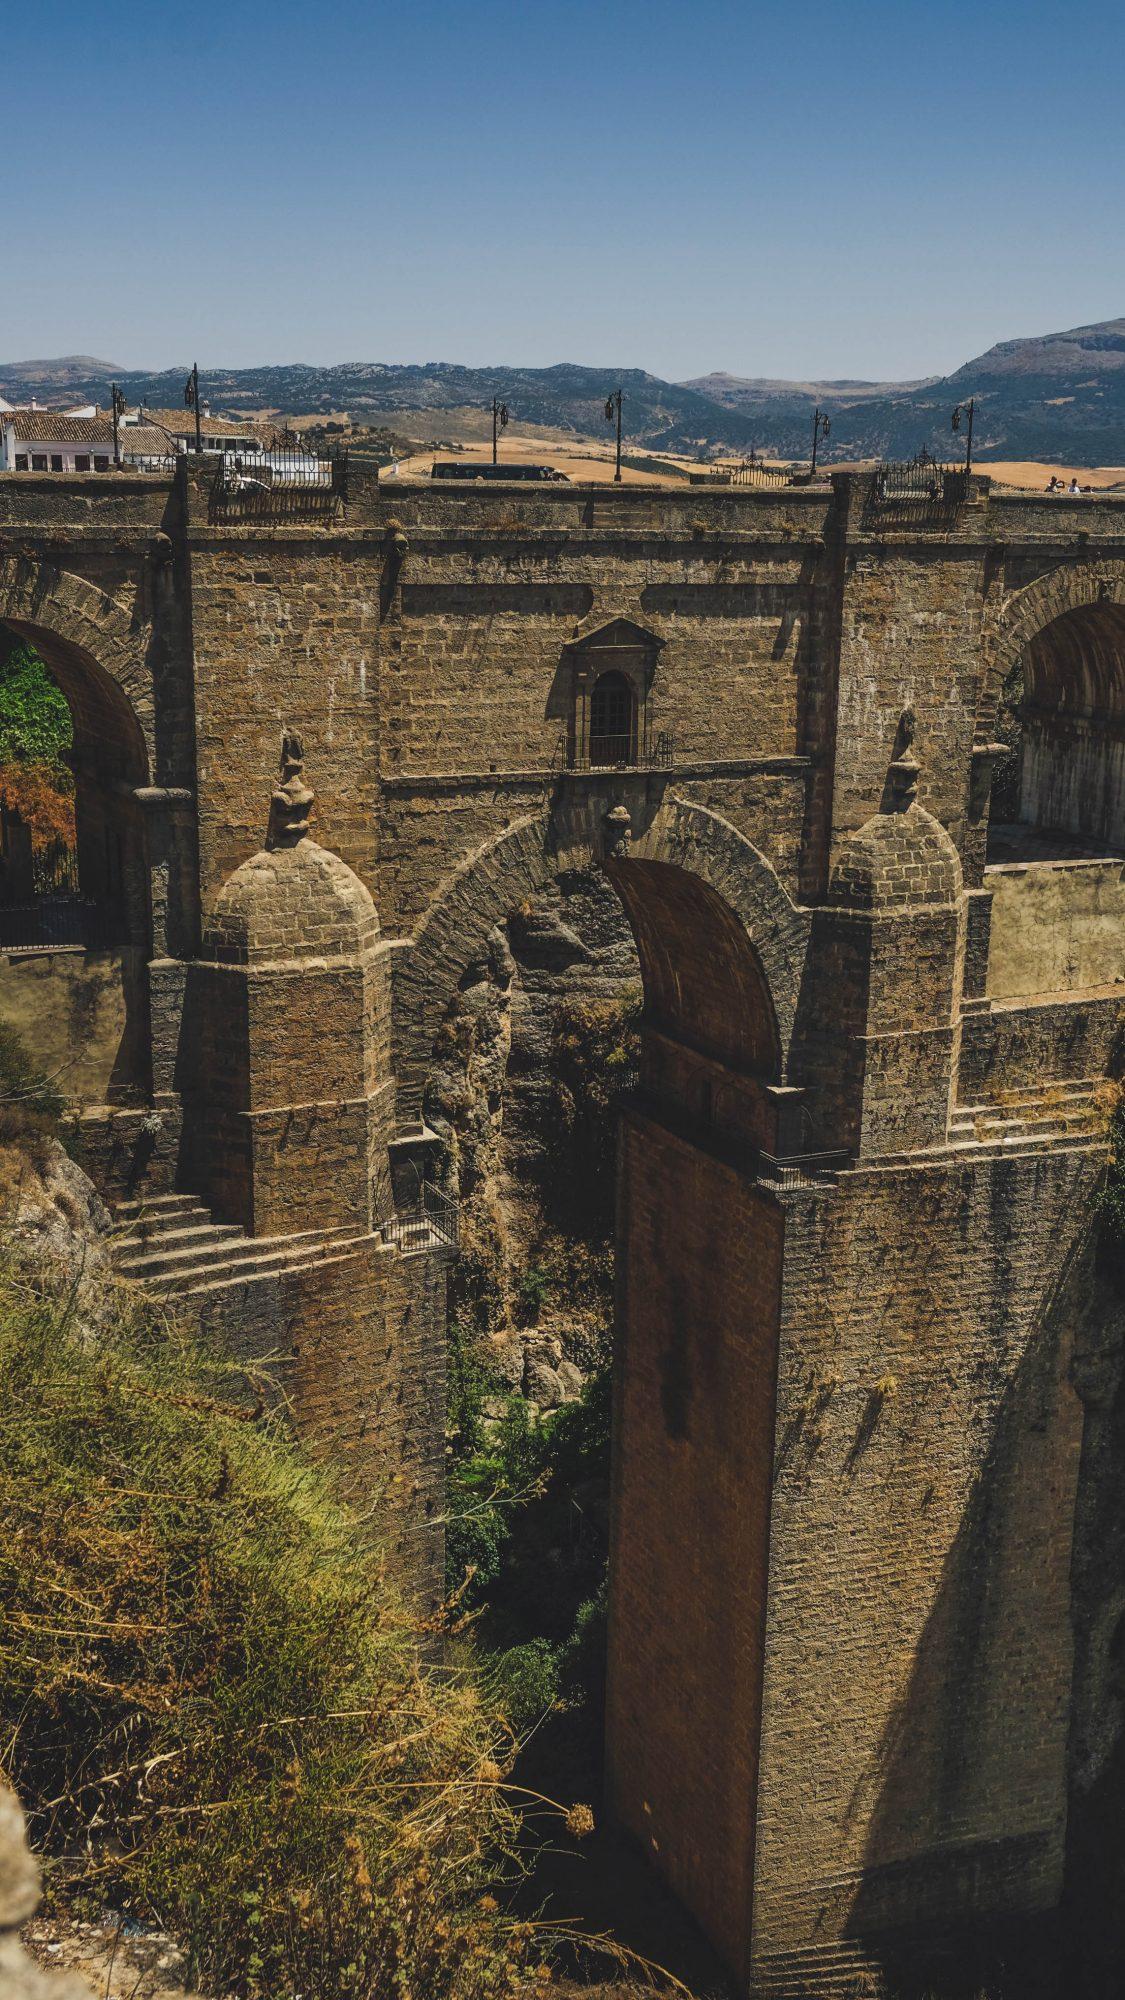 Pont neuf 100m de haut - Ronda, Espagne